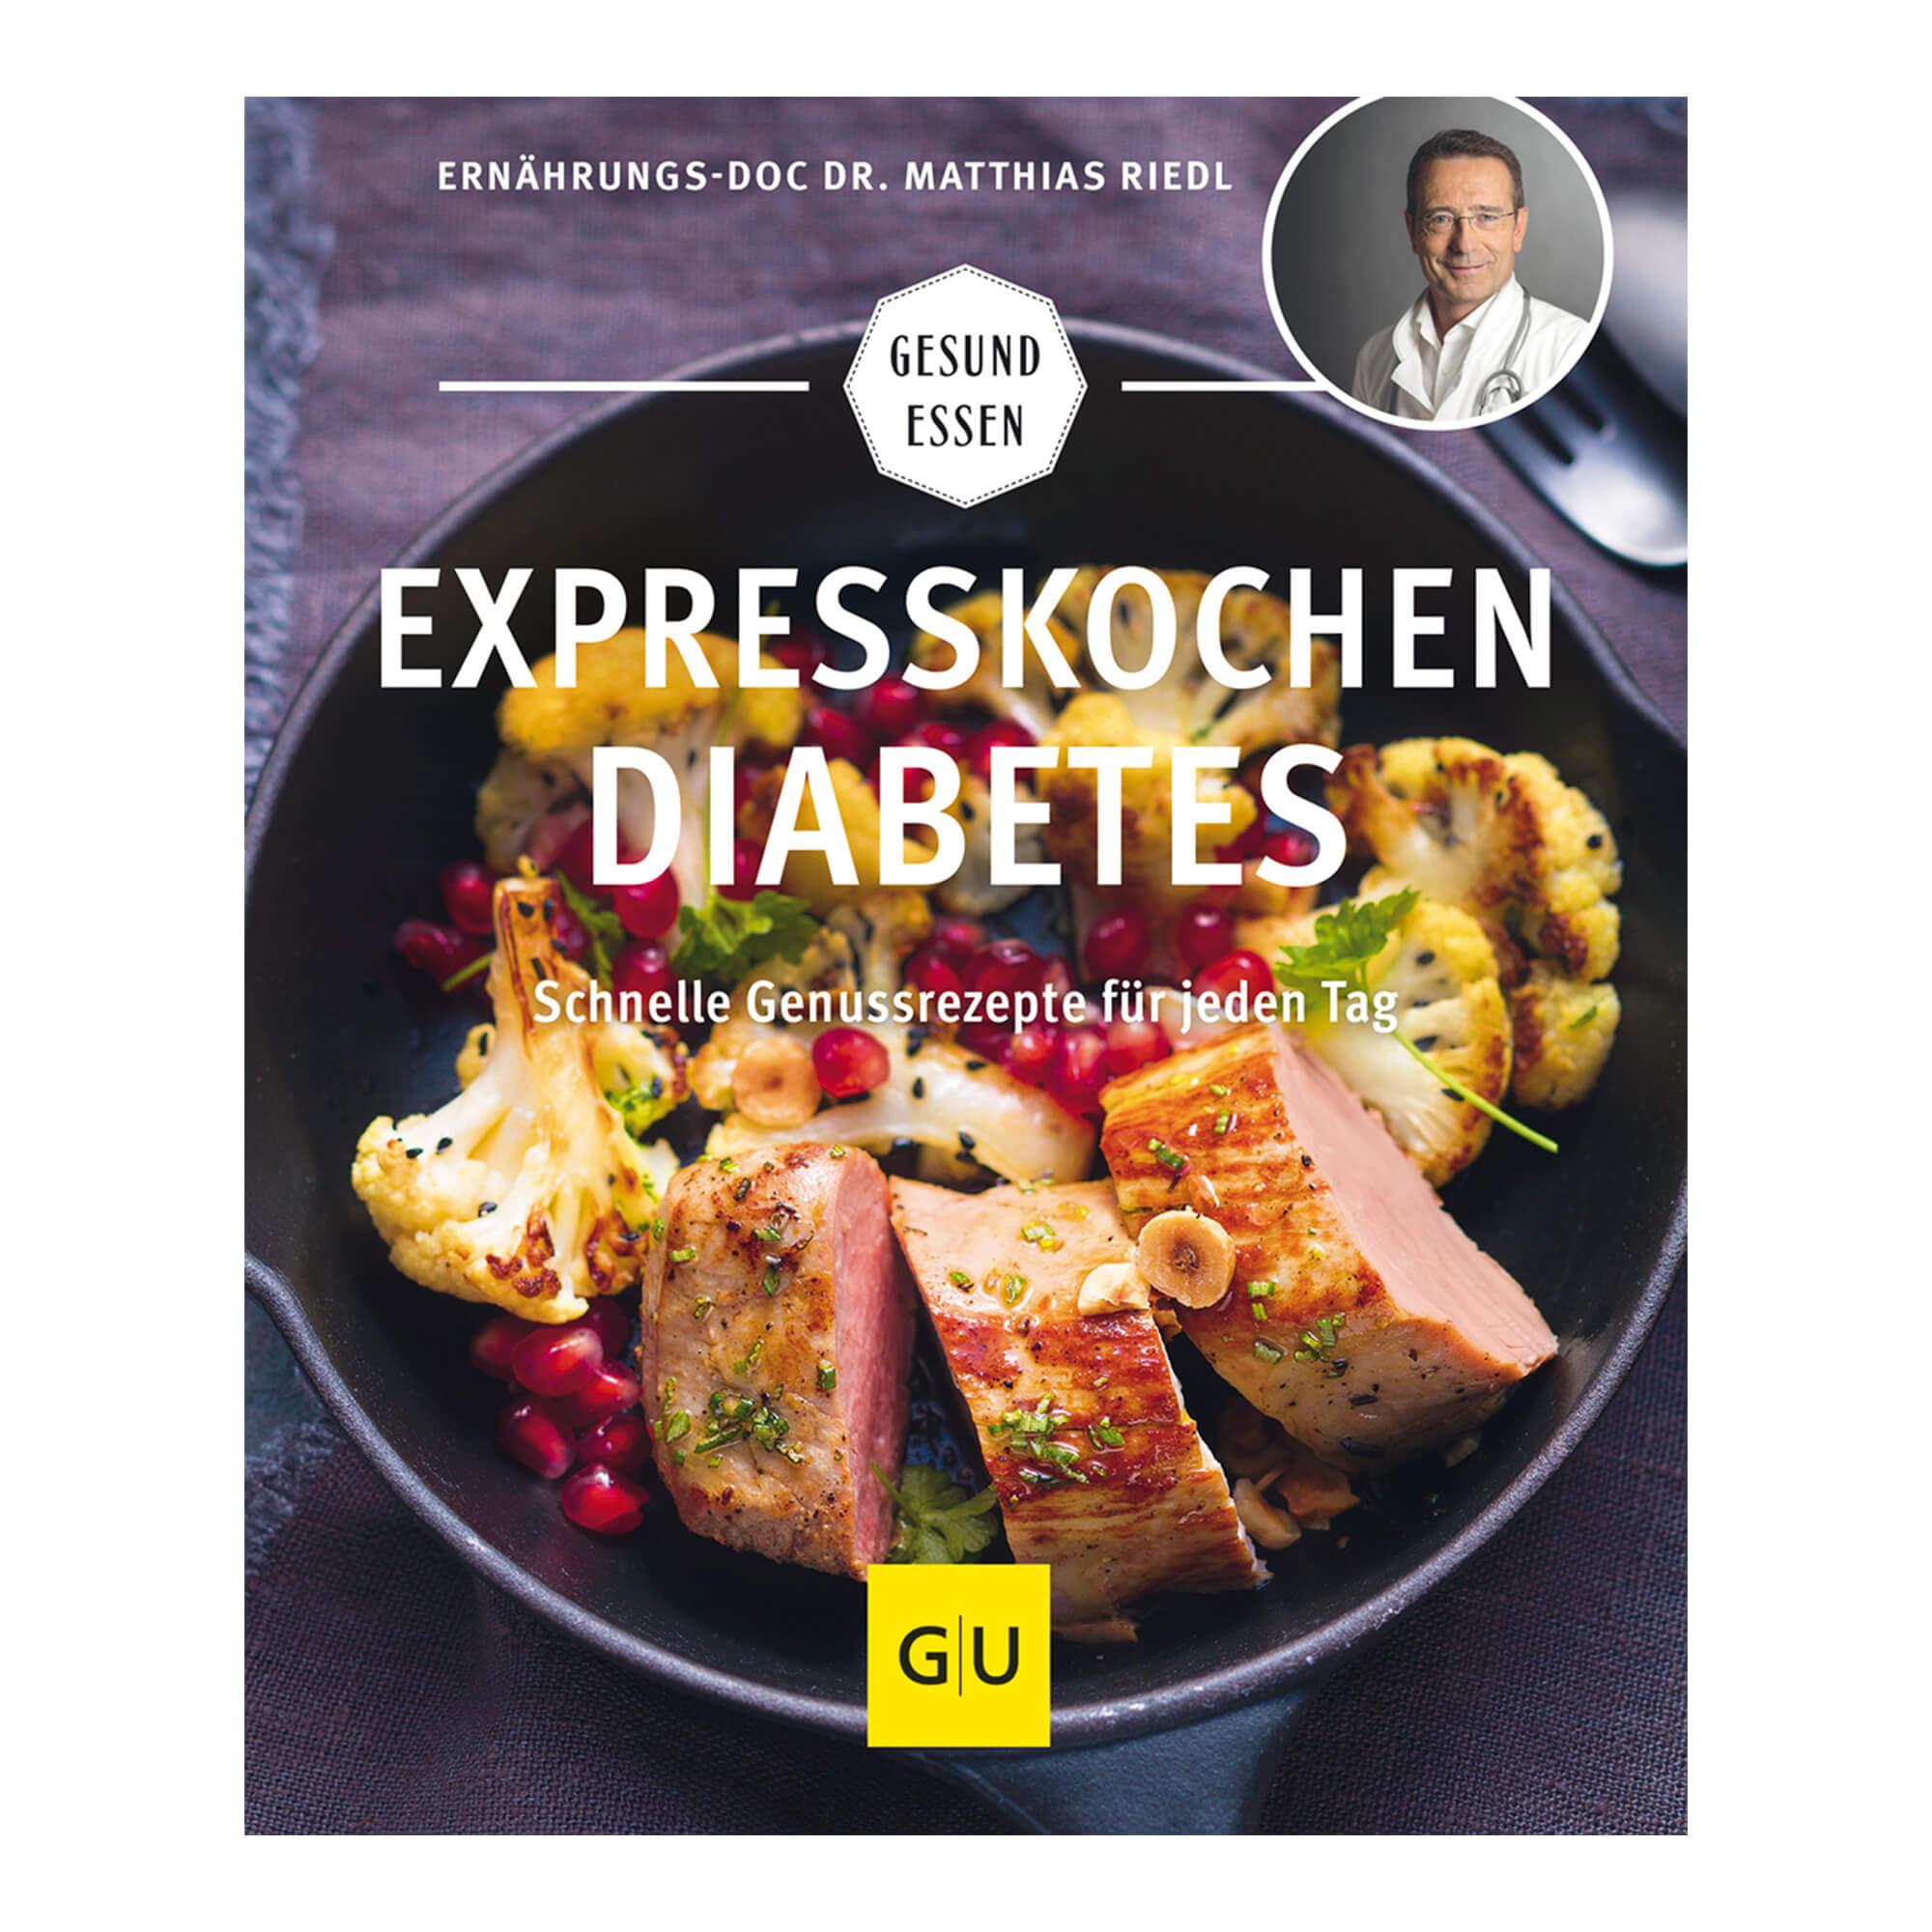 GU Expresskochen Diabetes